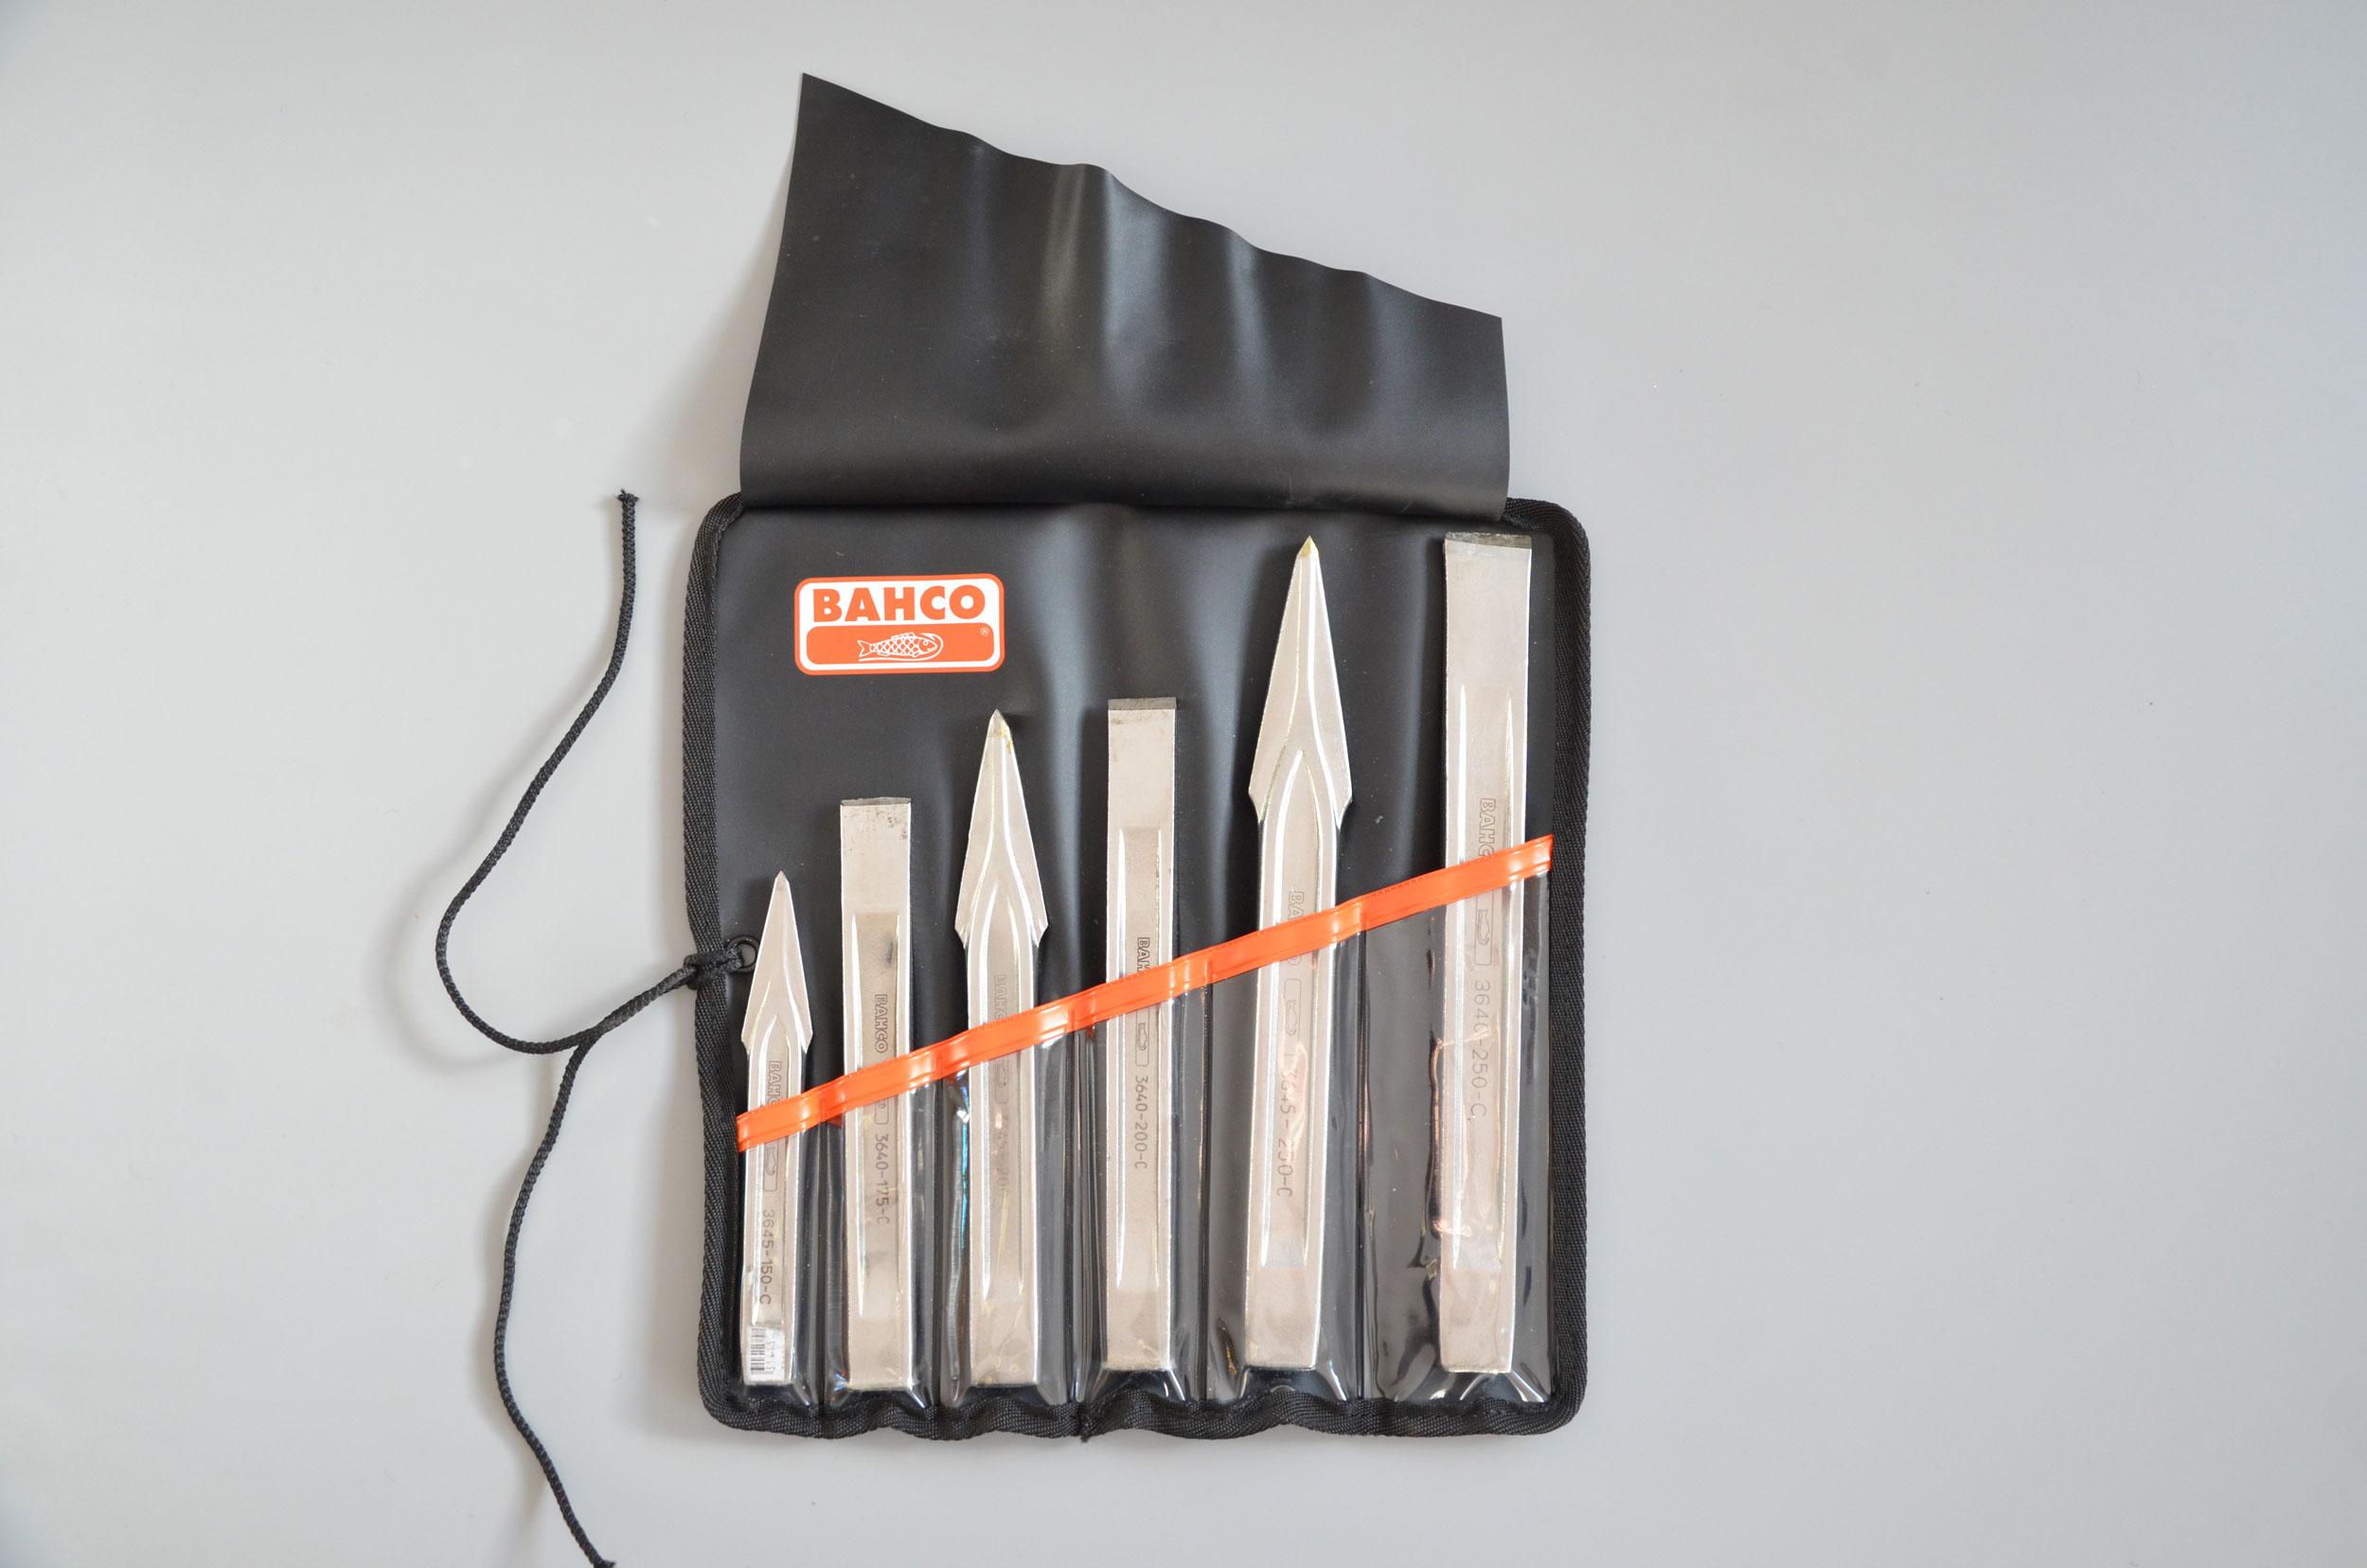 Fundas Kit de herramientas en PVC, polipiel, cuero